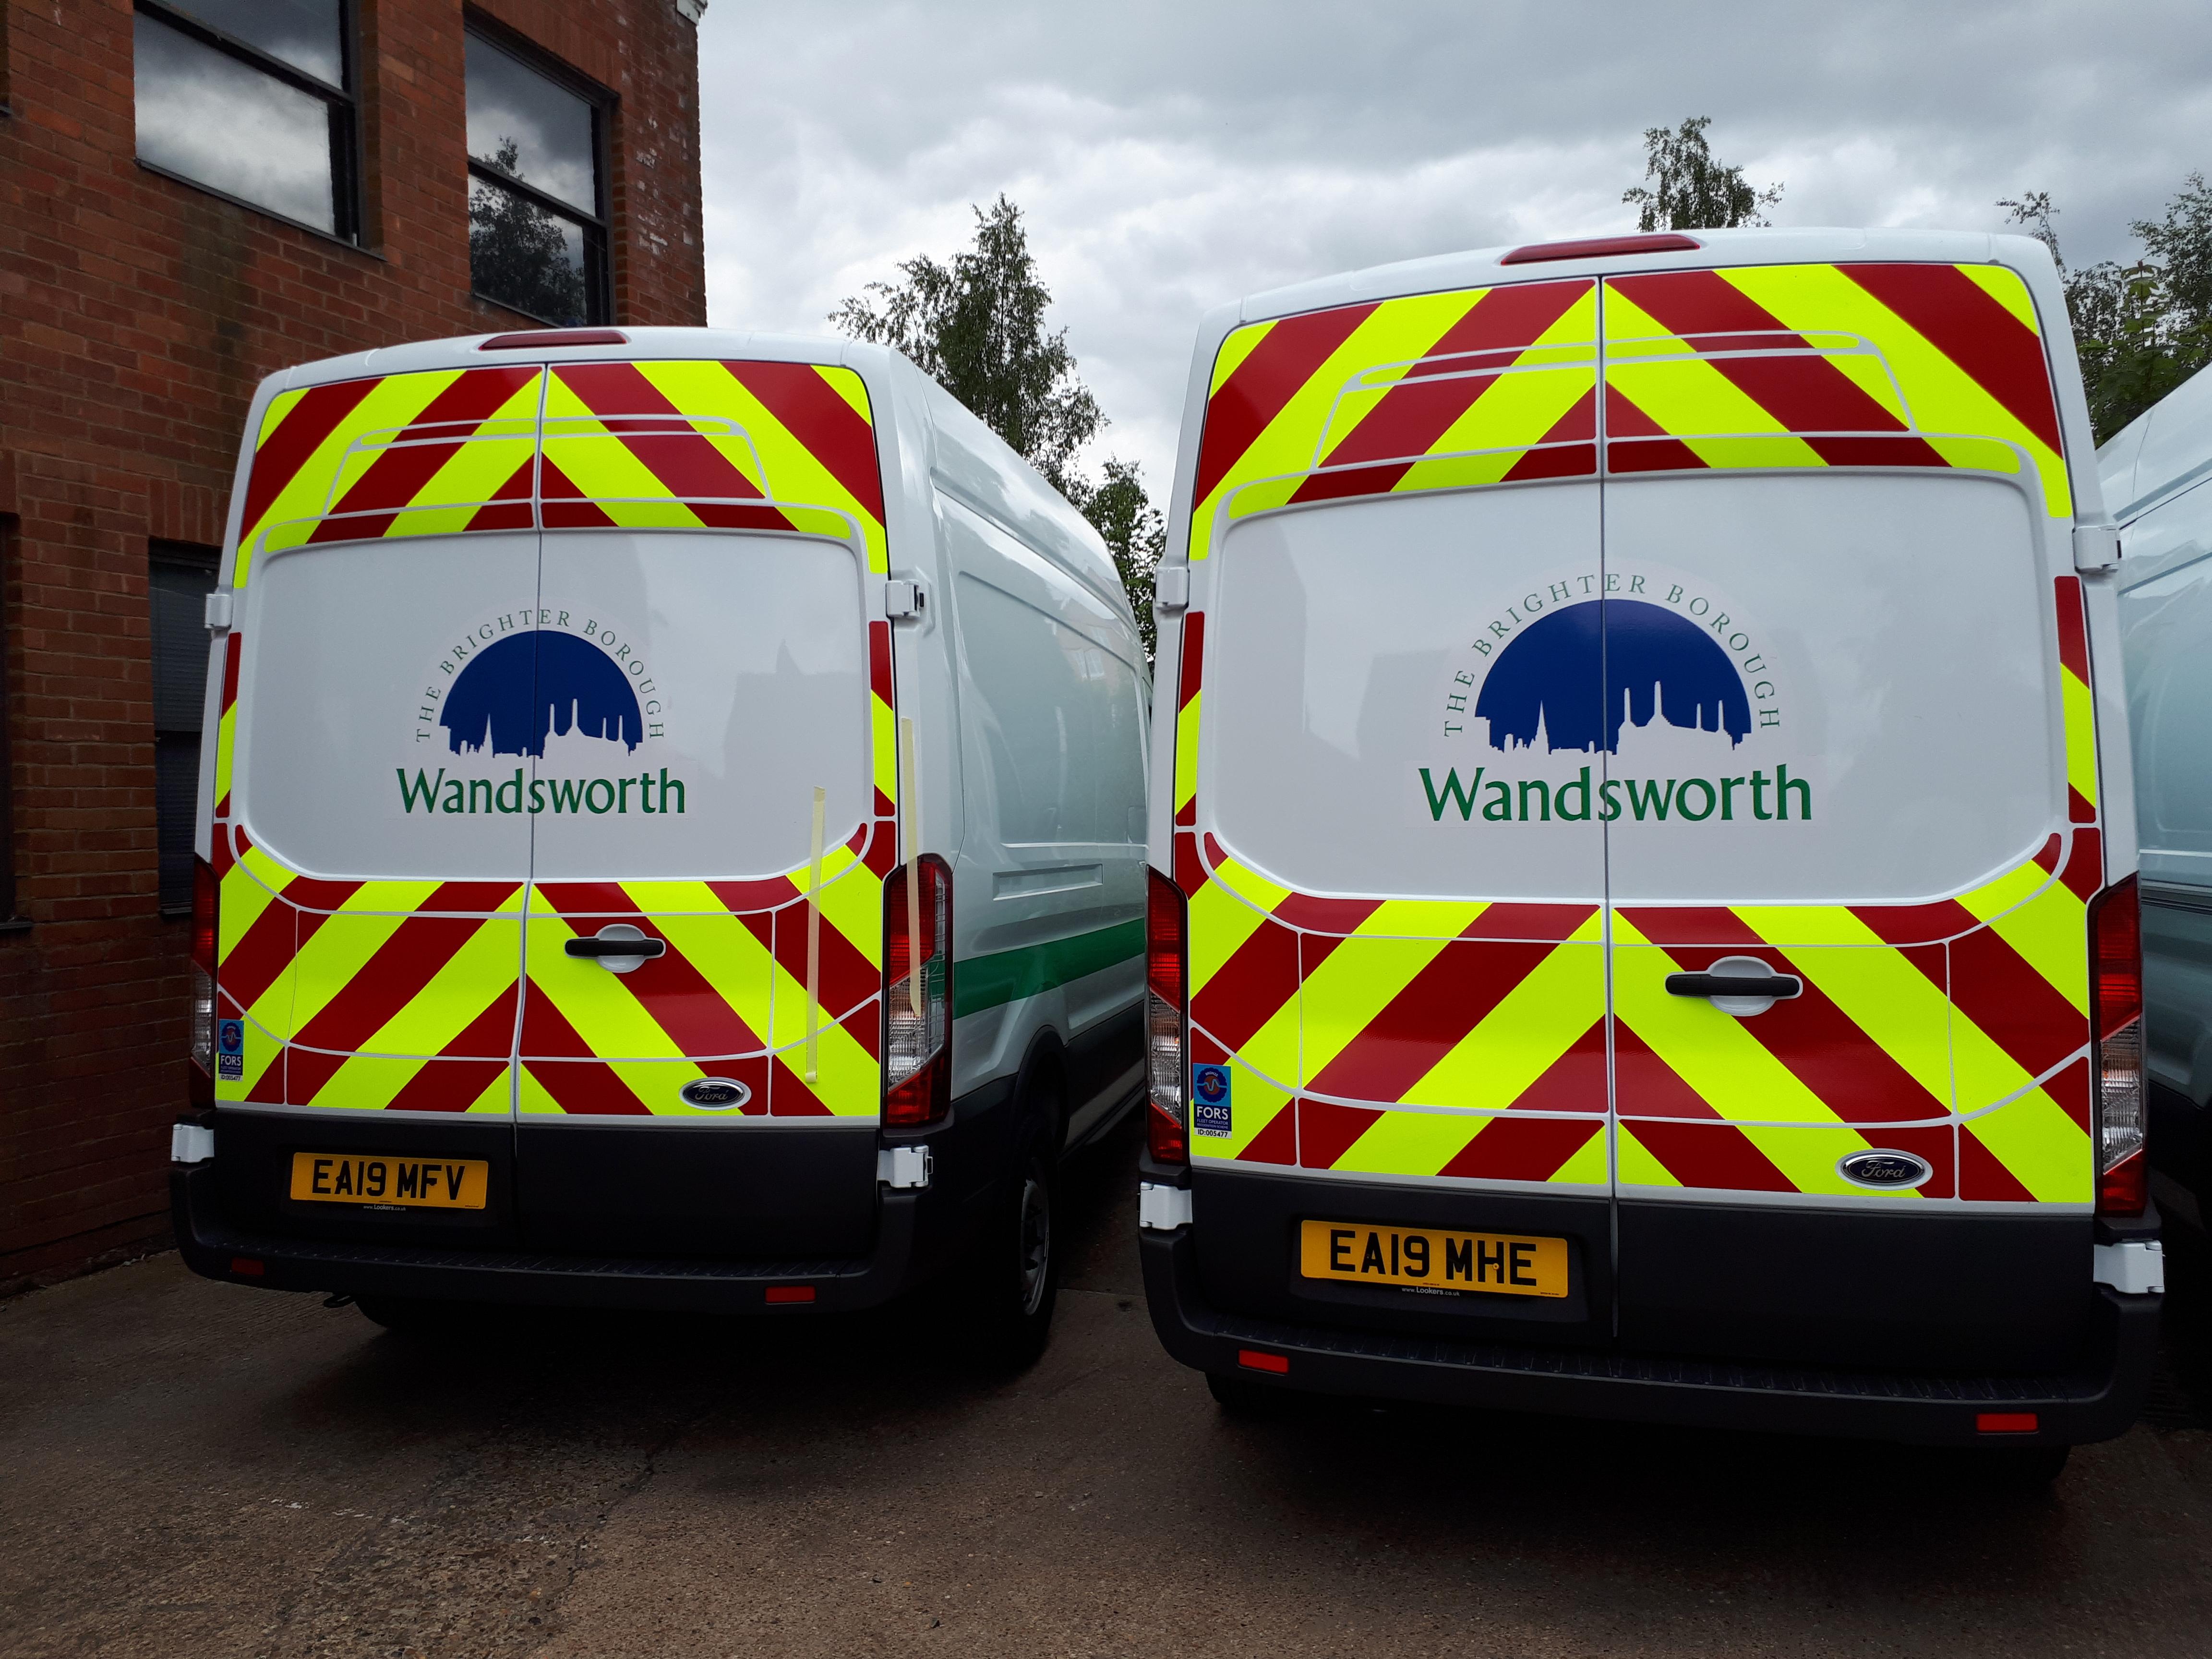 Wandsworth